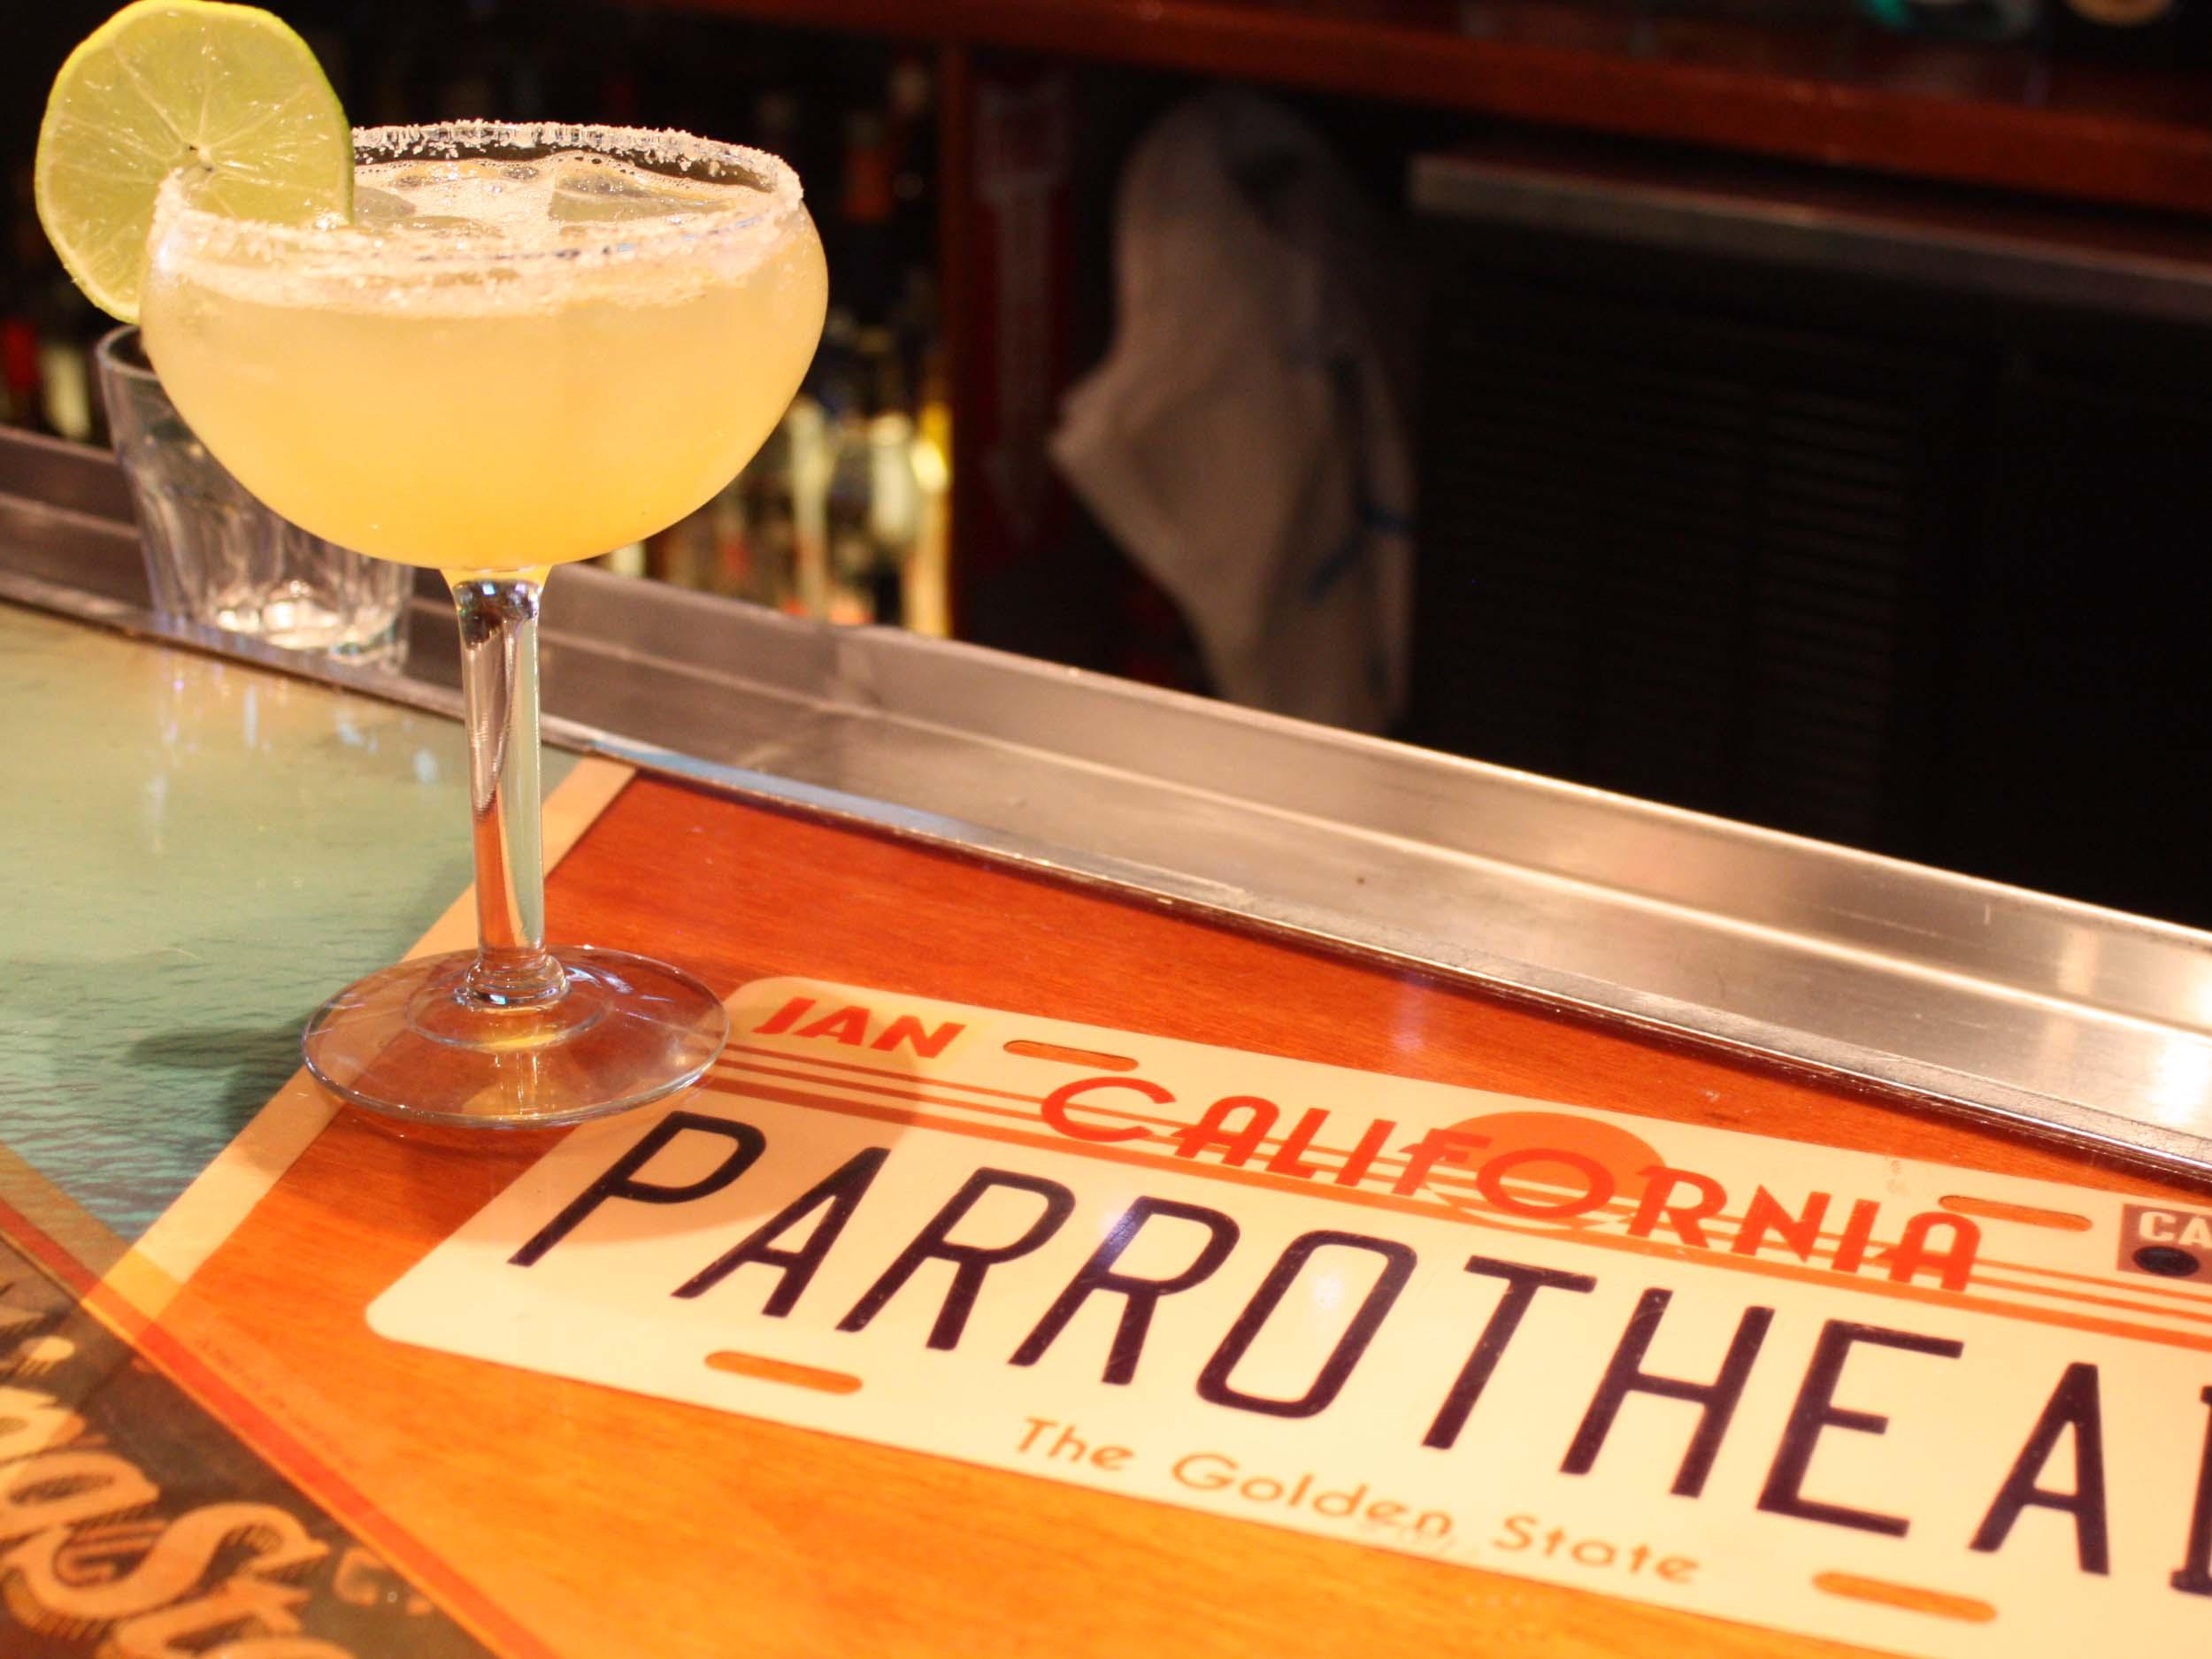 Jimmy Buffett's Margaritaville Parrothead Margarita